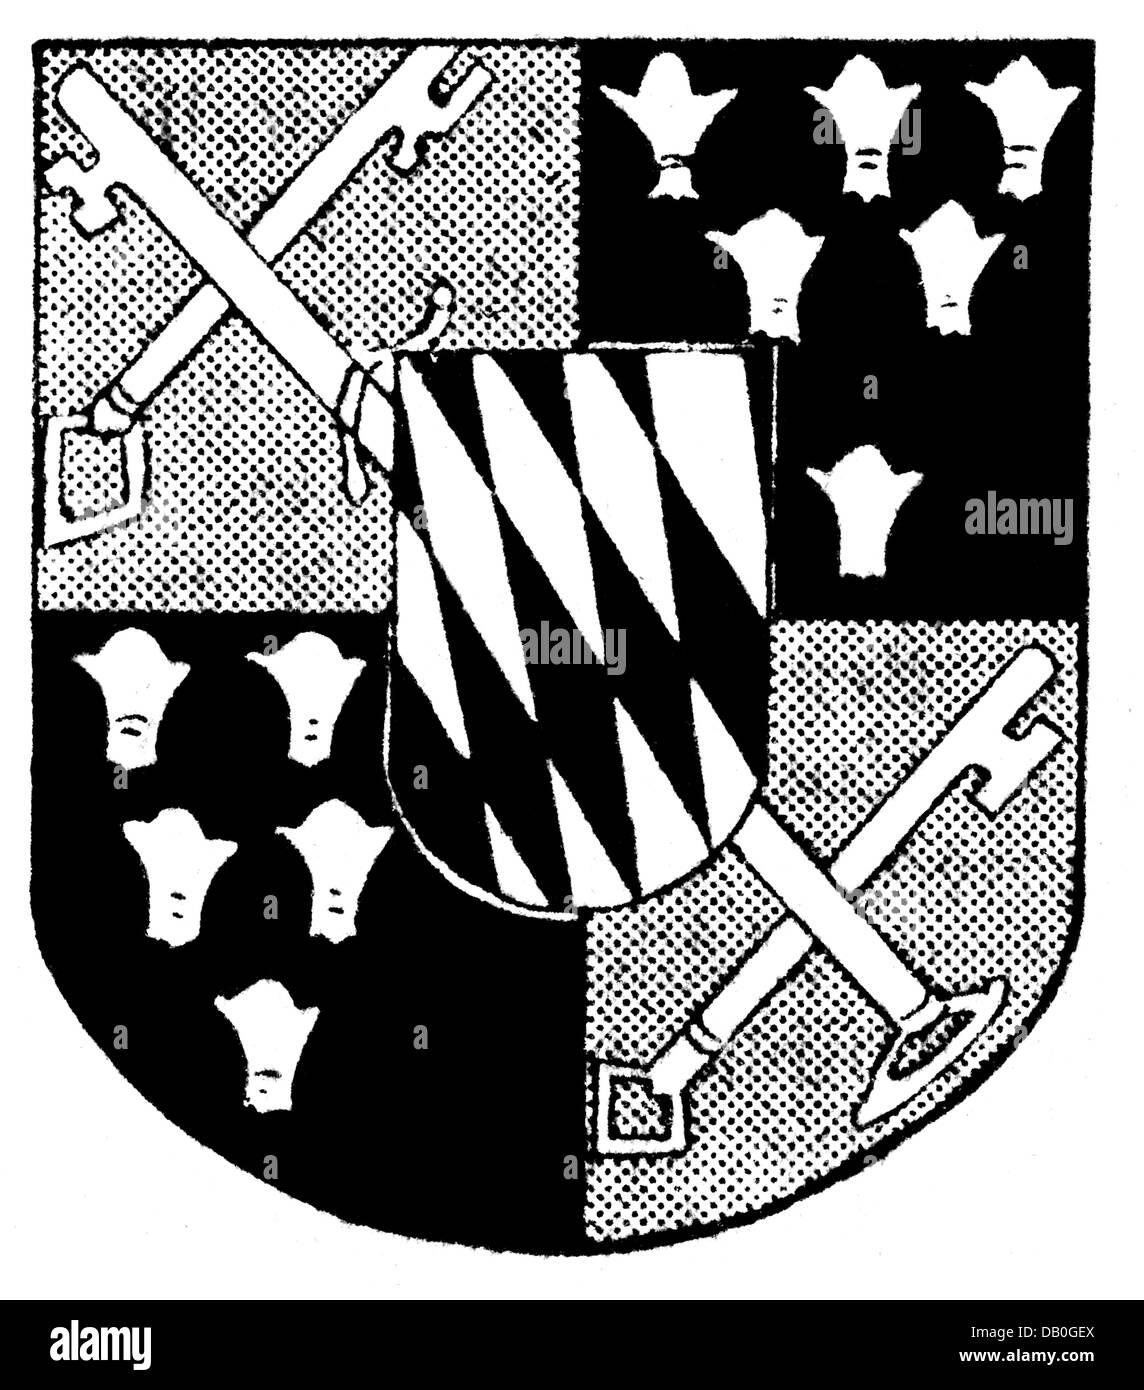 heraldry, coat of arms, Deutschland, city arms, Berchtesgaden, drawing, 20th century, keys, lozenges, Upper Bavaria, - Stock Image